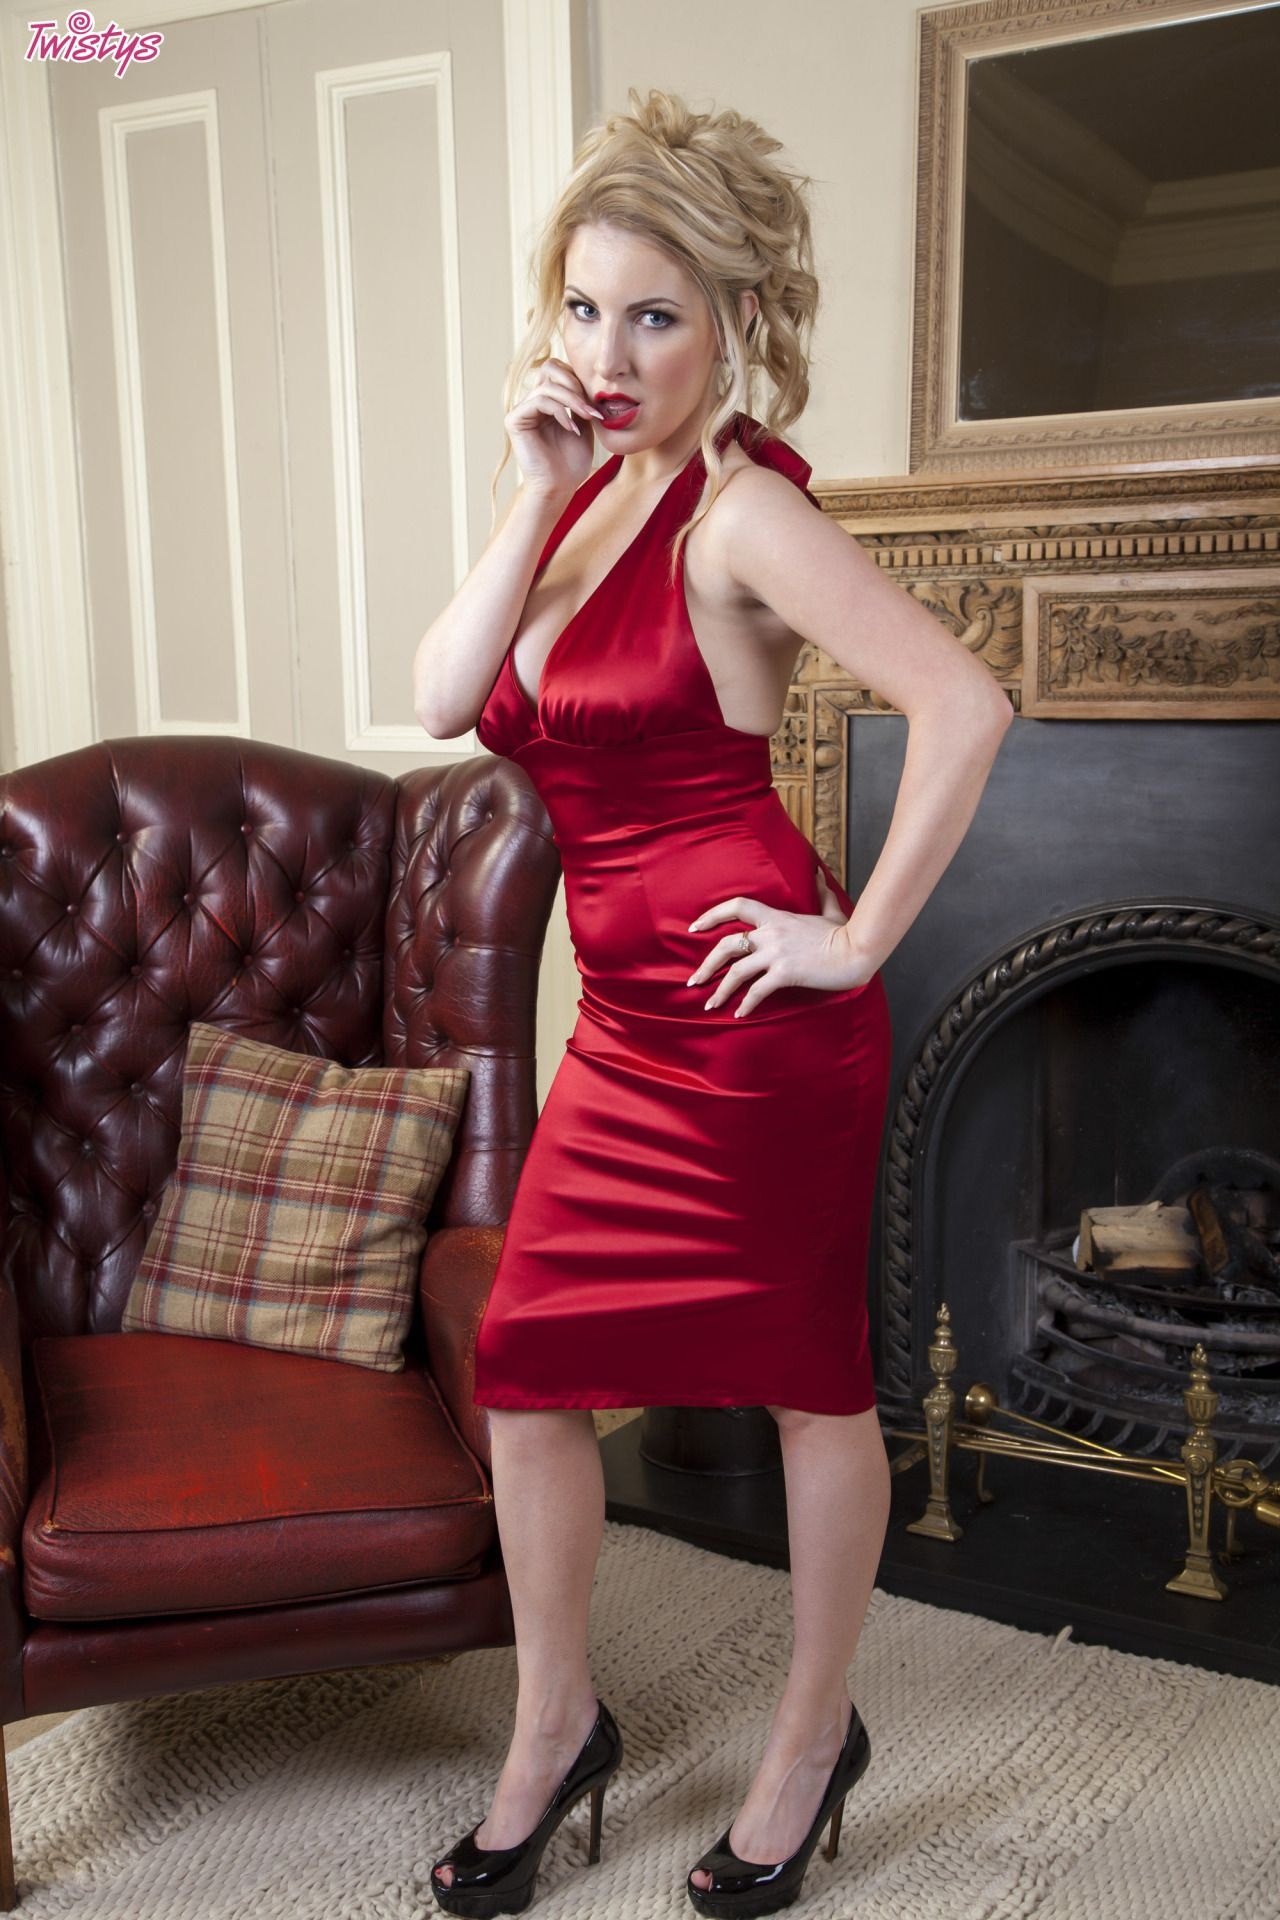 tumblr_n1084ybvvL1r48jffo1_1280.jpg (1280×1920) | SEXY DRESSES ...